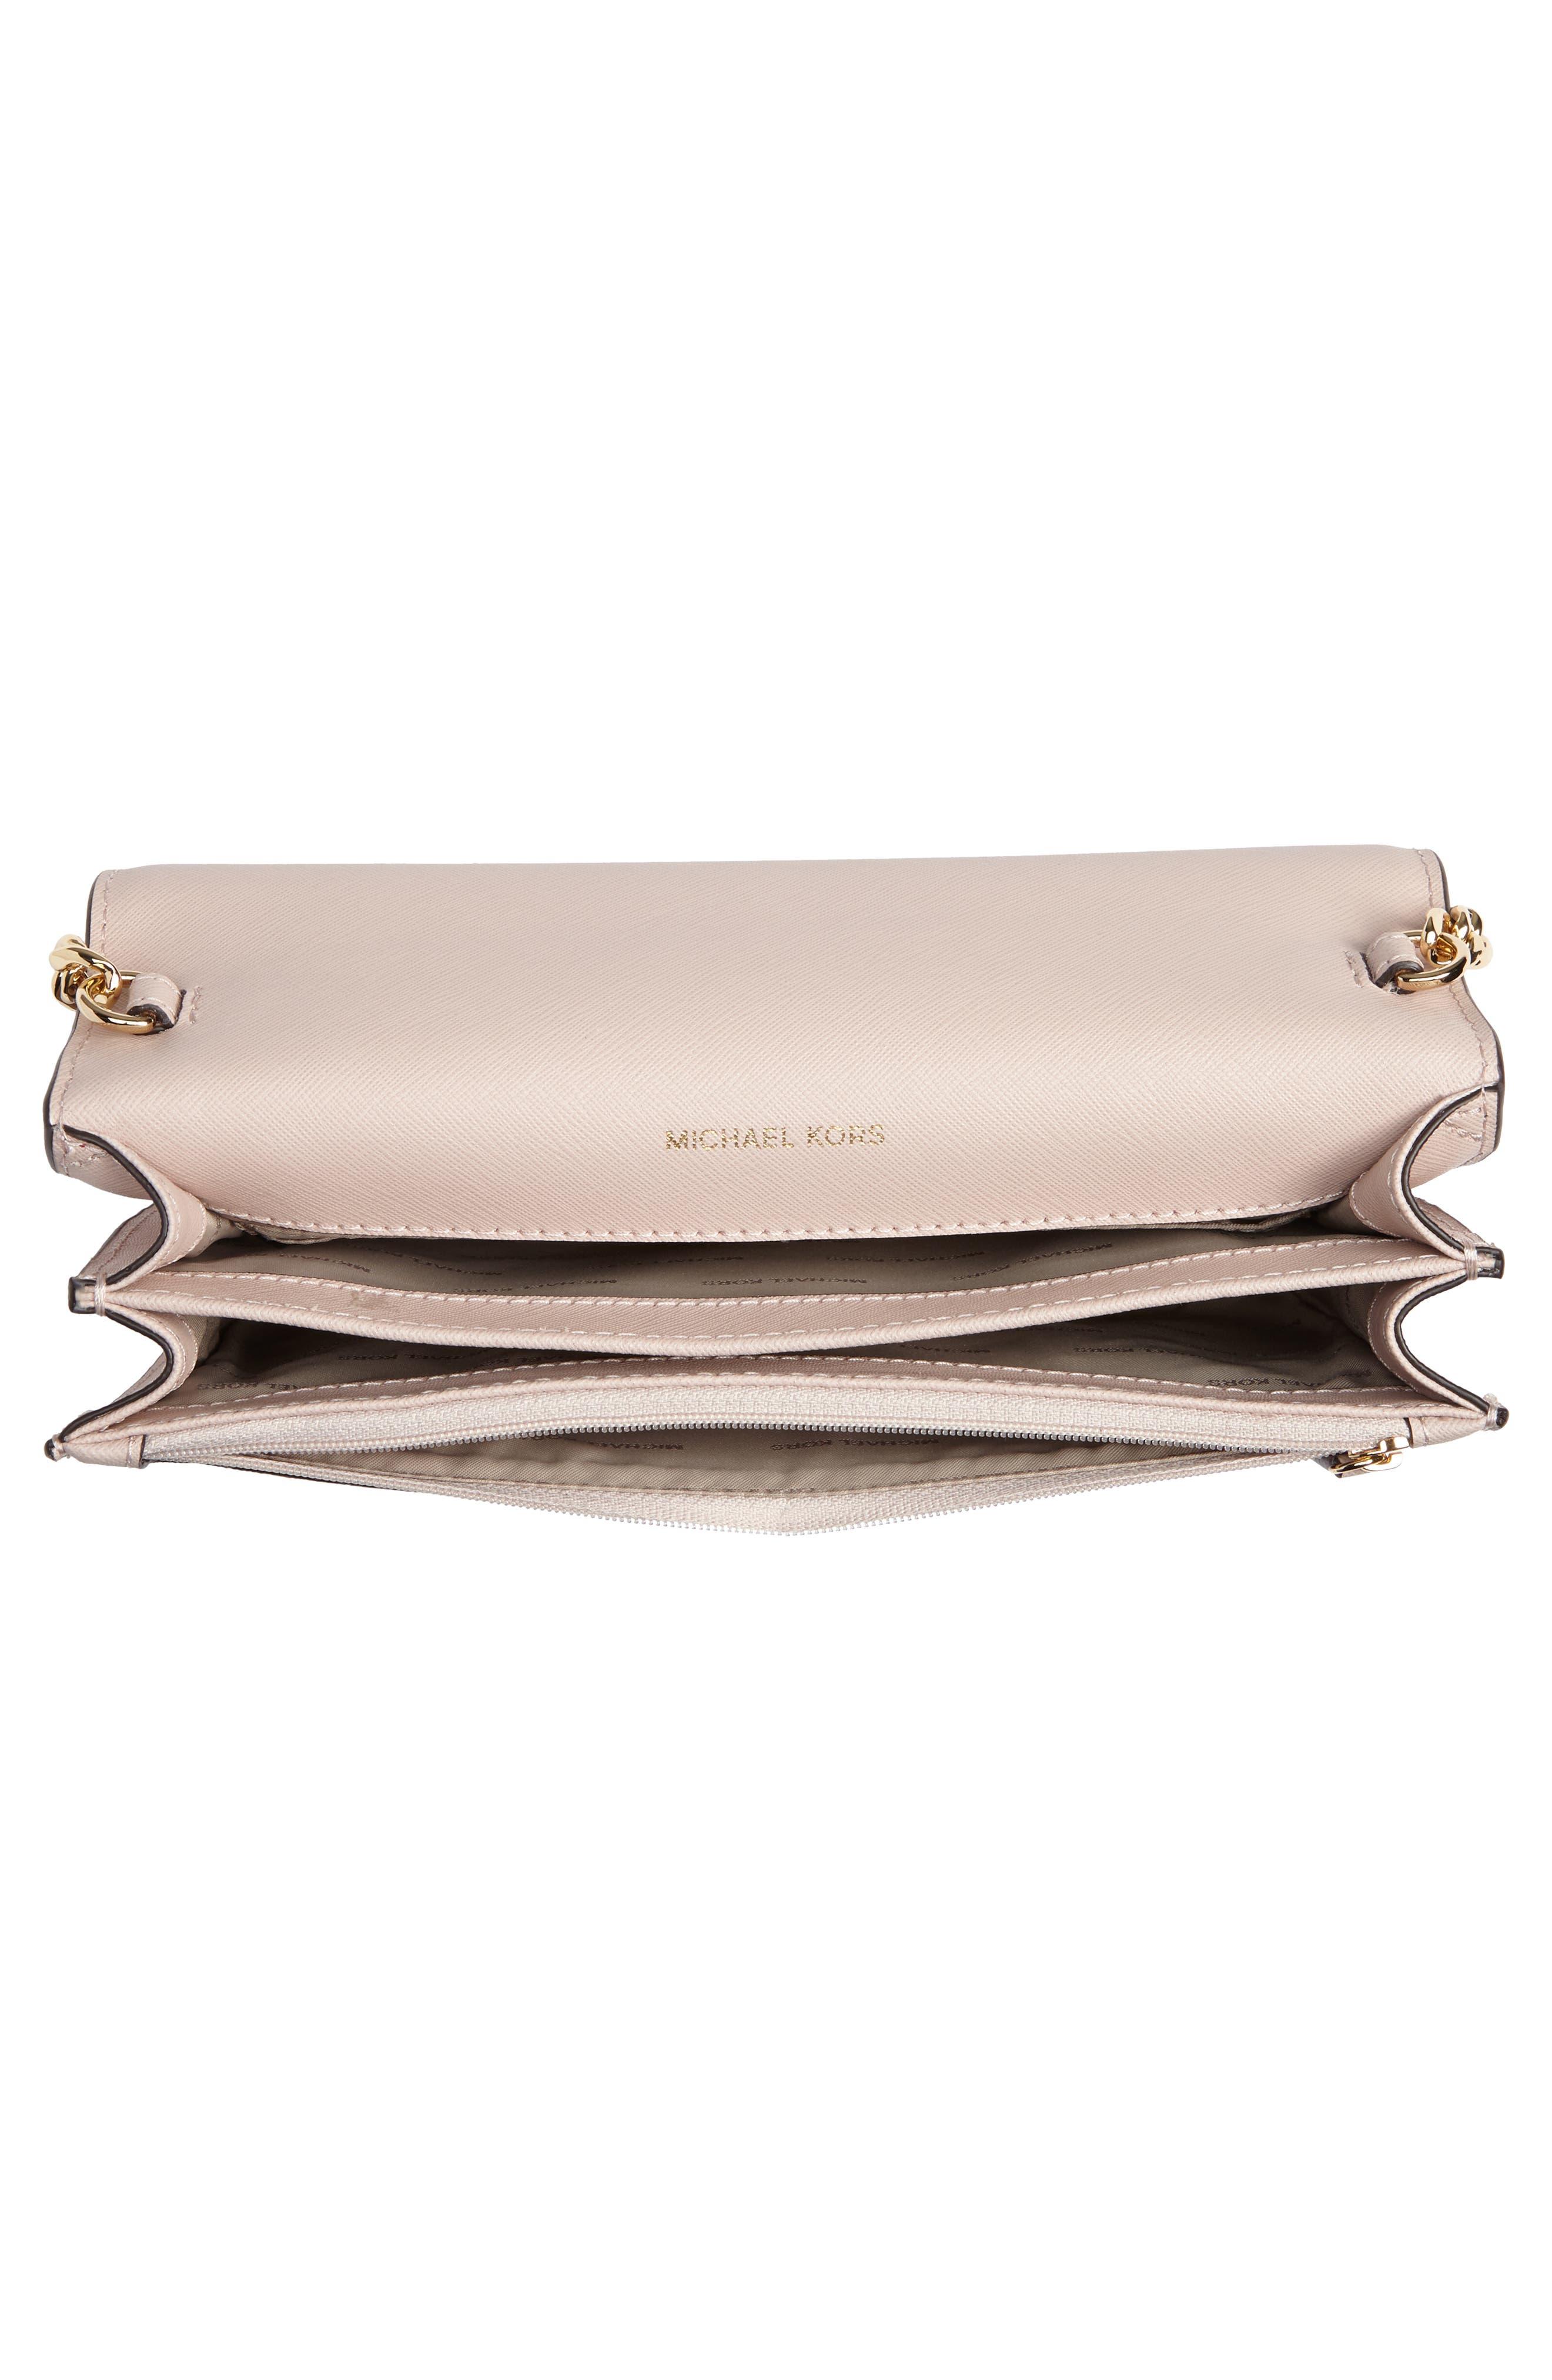 Large Daniela Leather Crossbody Bag,                             Alternate thumbnail 4, color,                             SOFT PINK